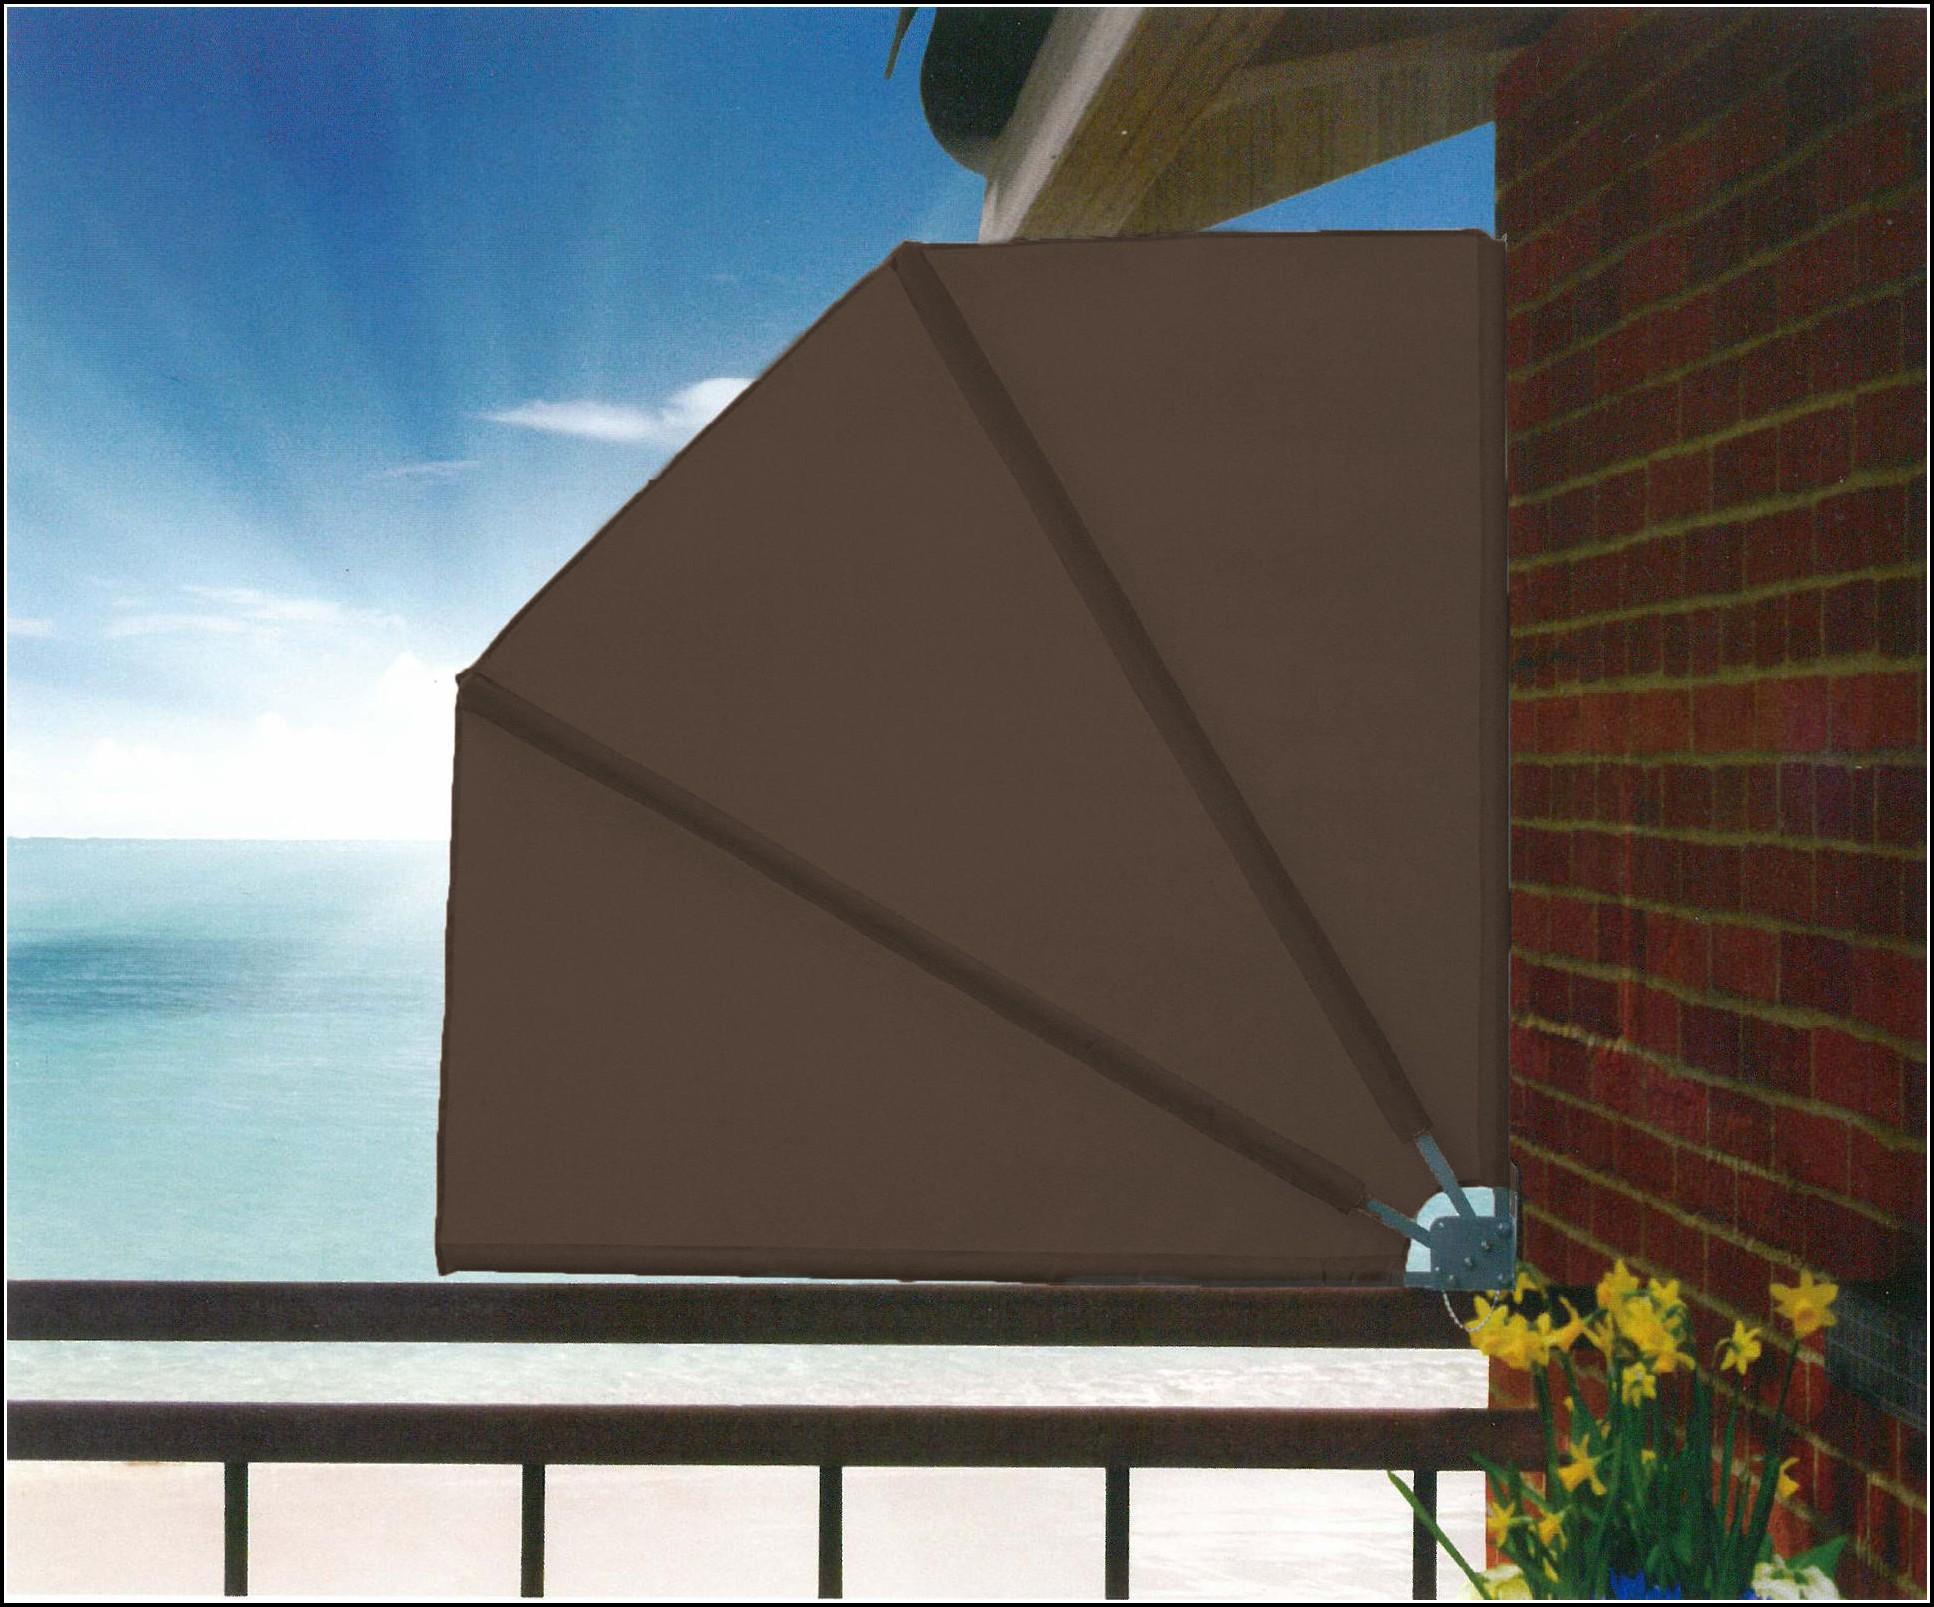 Balkon Sichtschutz Facher Ohne Bohren Dolce Vizio Tiramisu